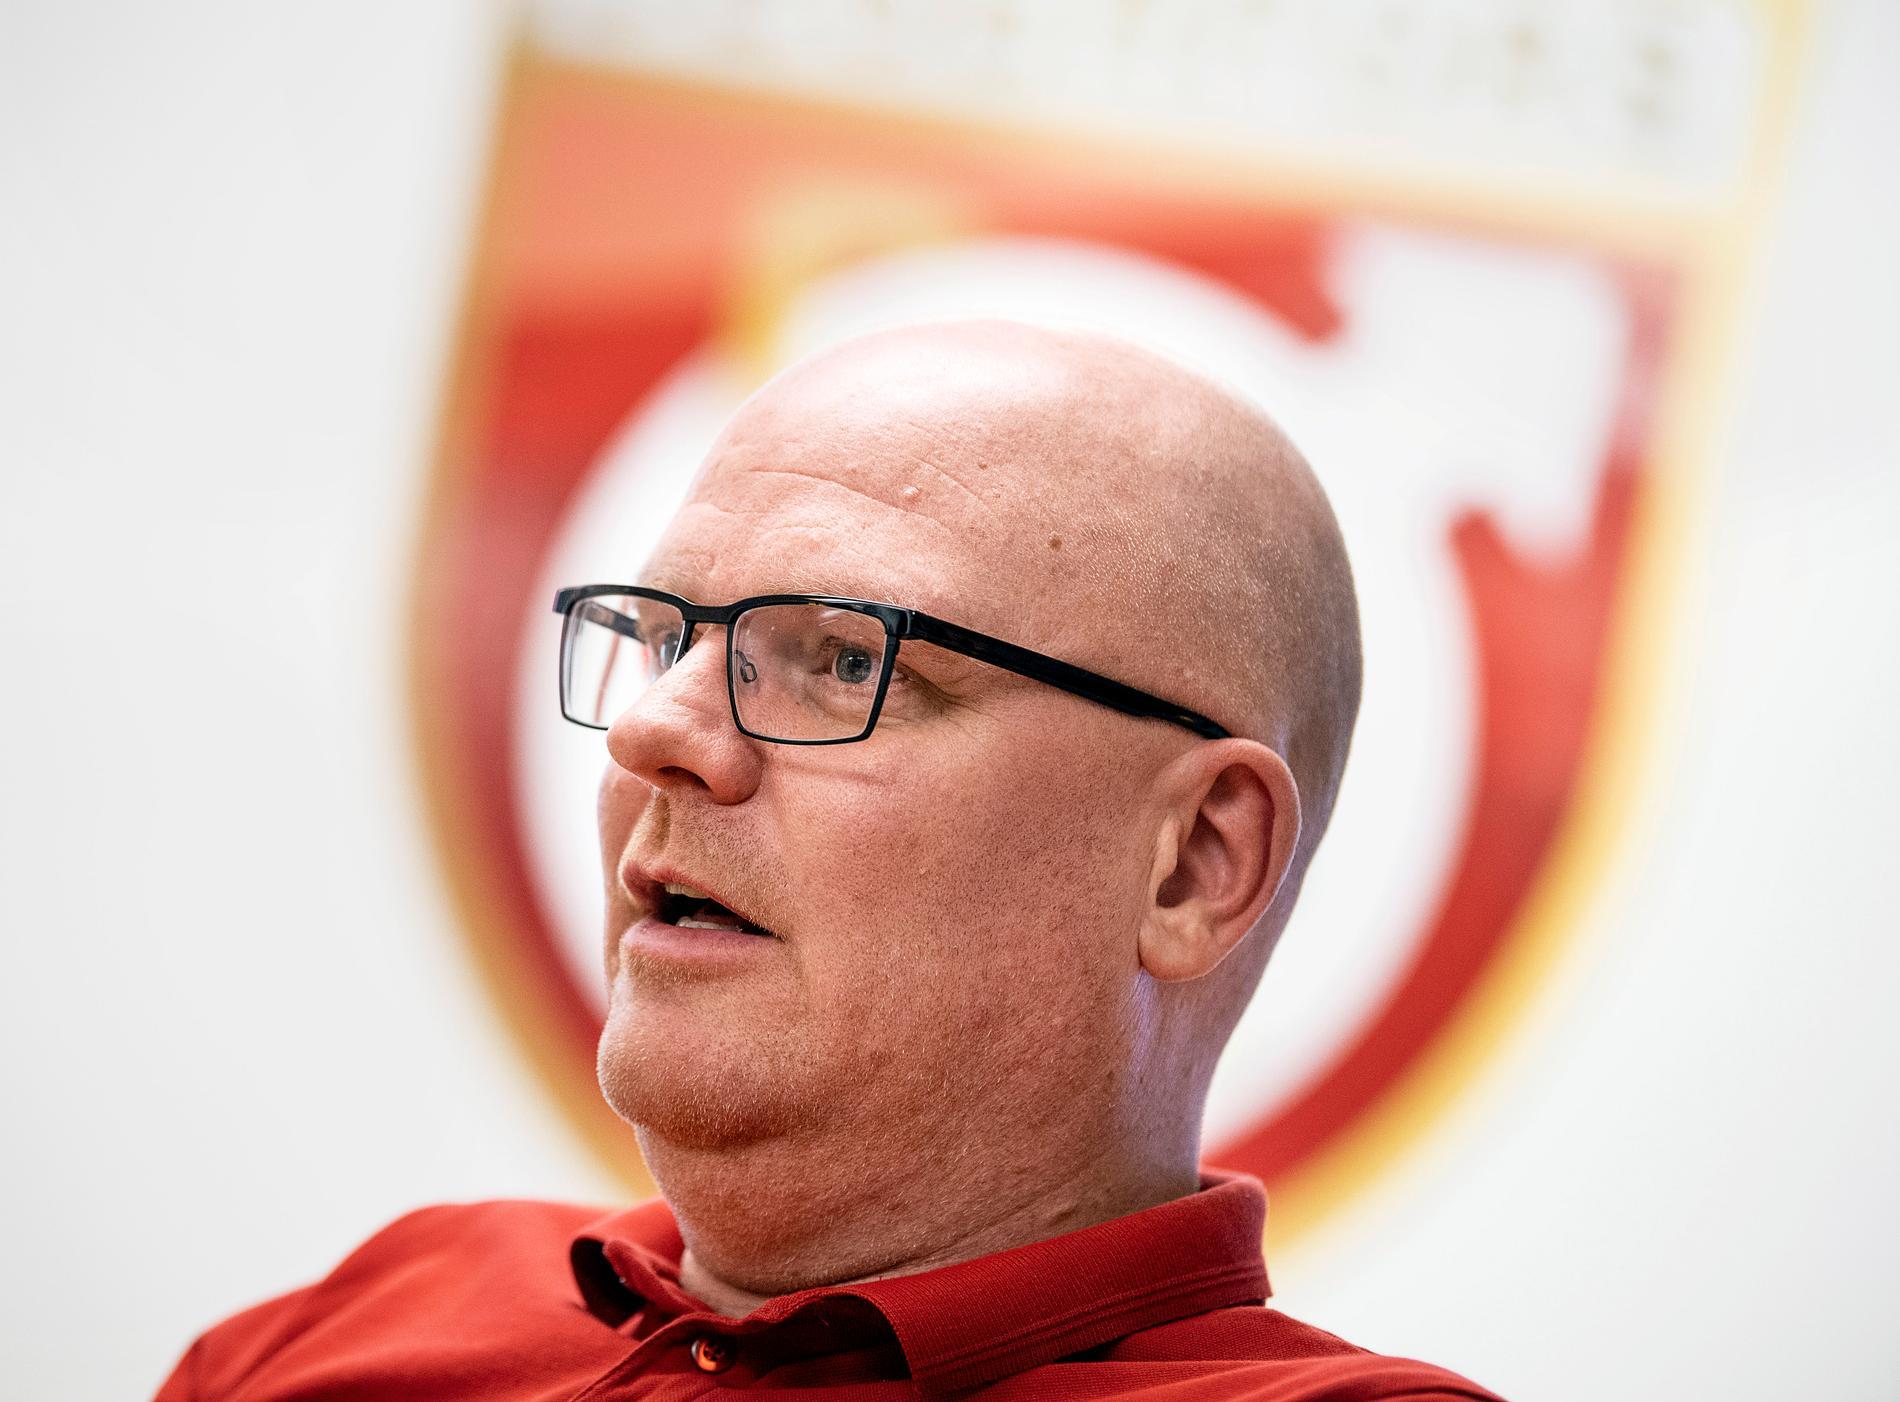 Degerfors sportchef Patrik Werner.